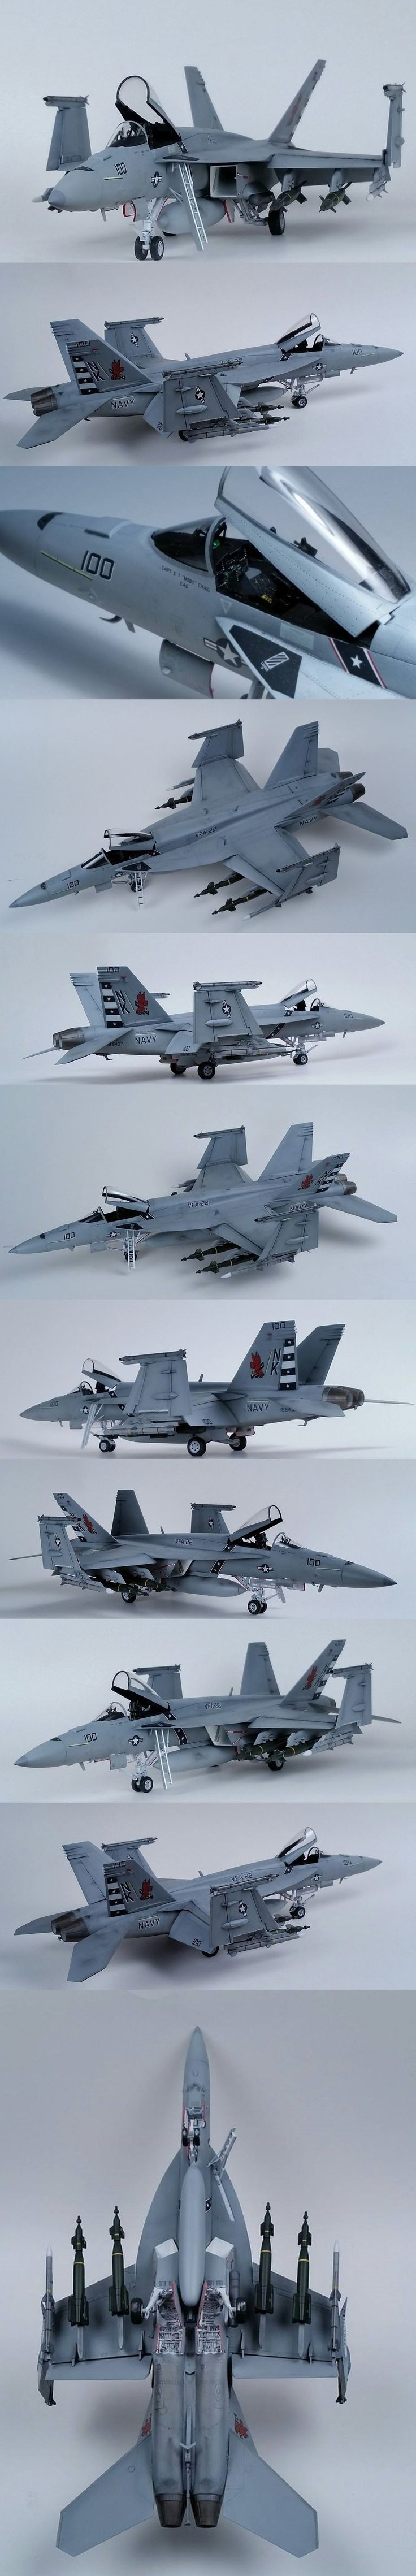 F/A-18E Superhornet | 1:48 scale